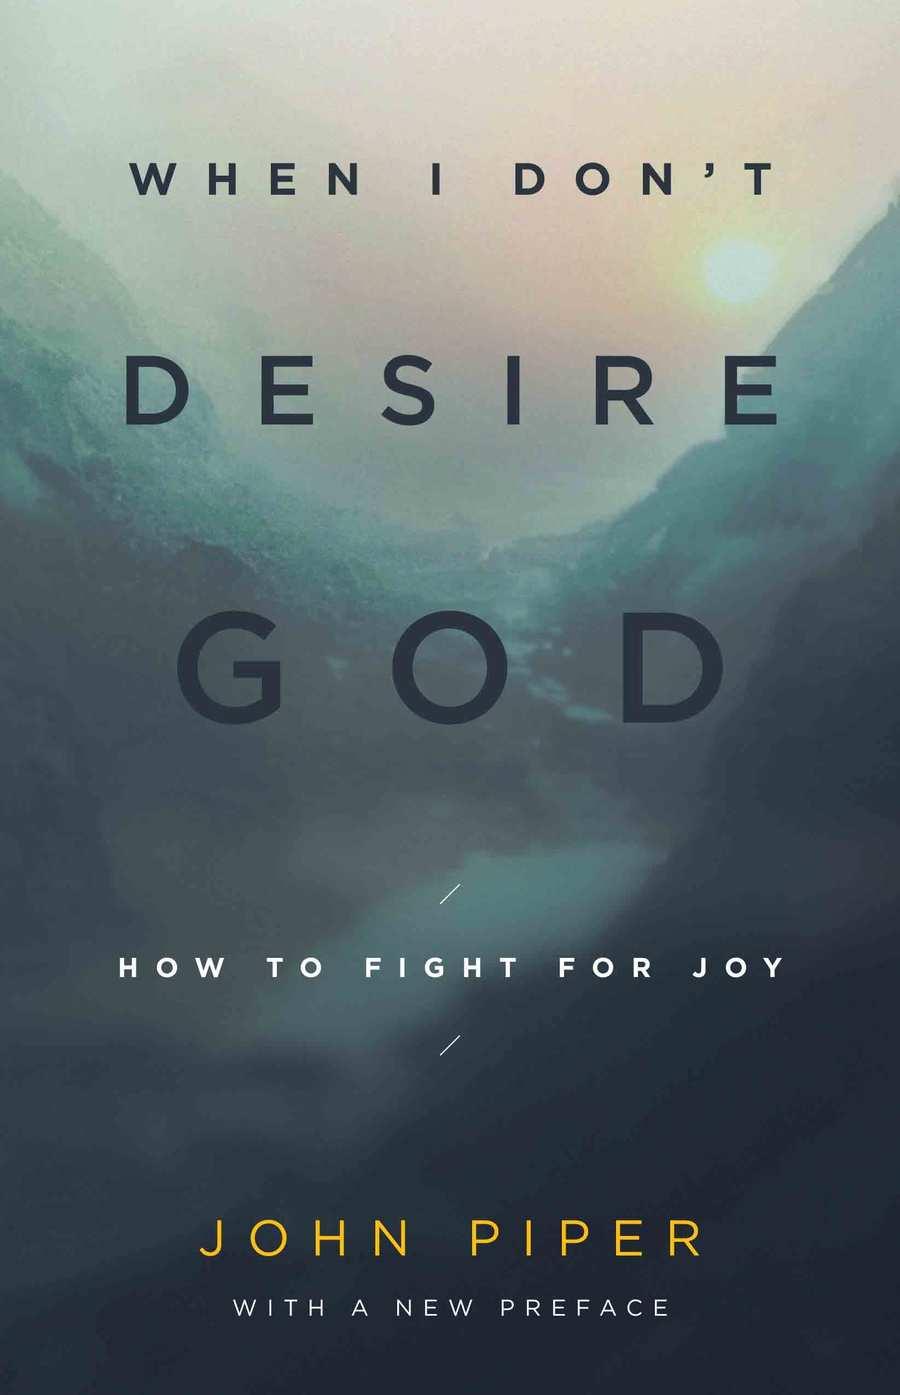 large_when-i-don-t-desire-god.jpg